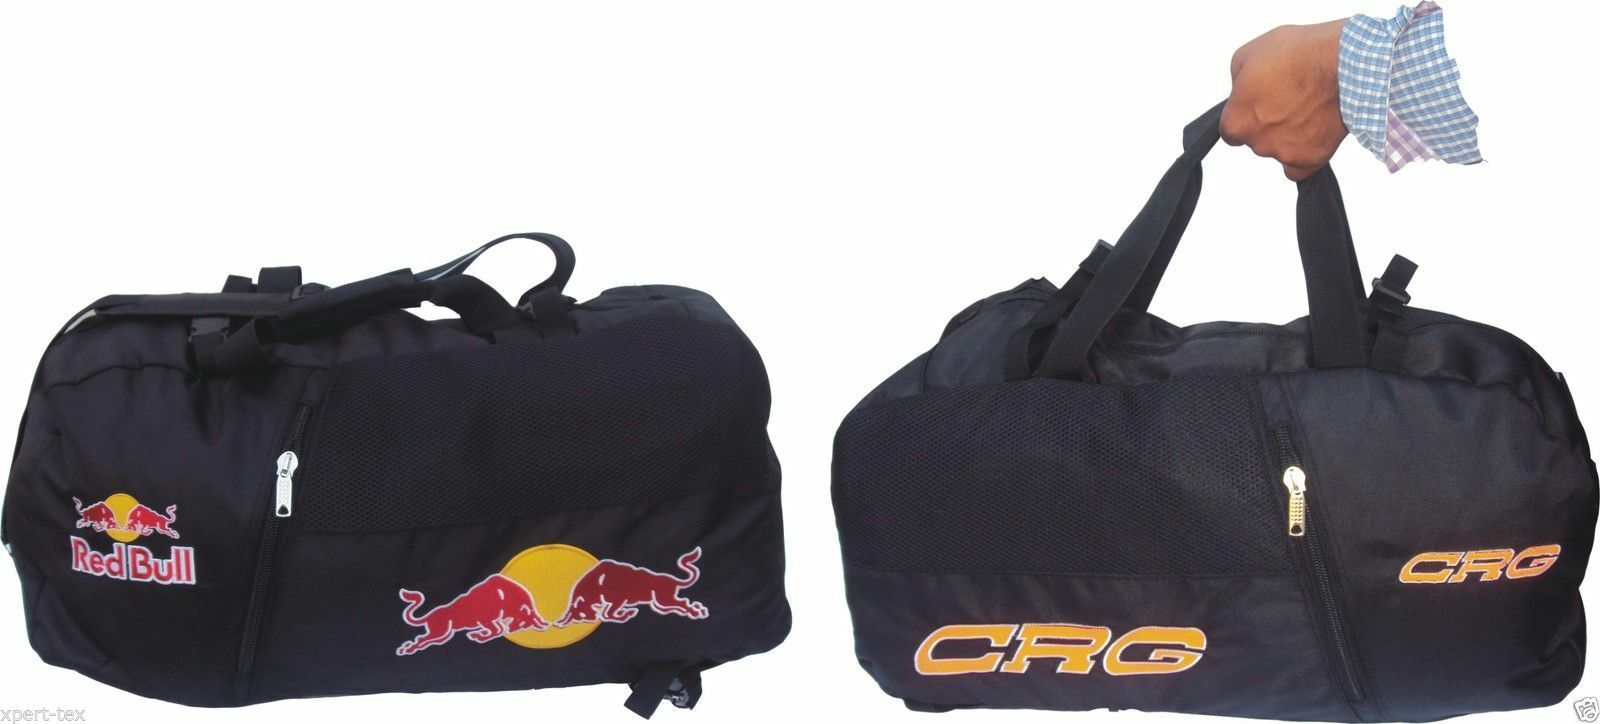 RedBull & CRG Sports Bags